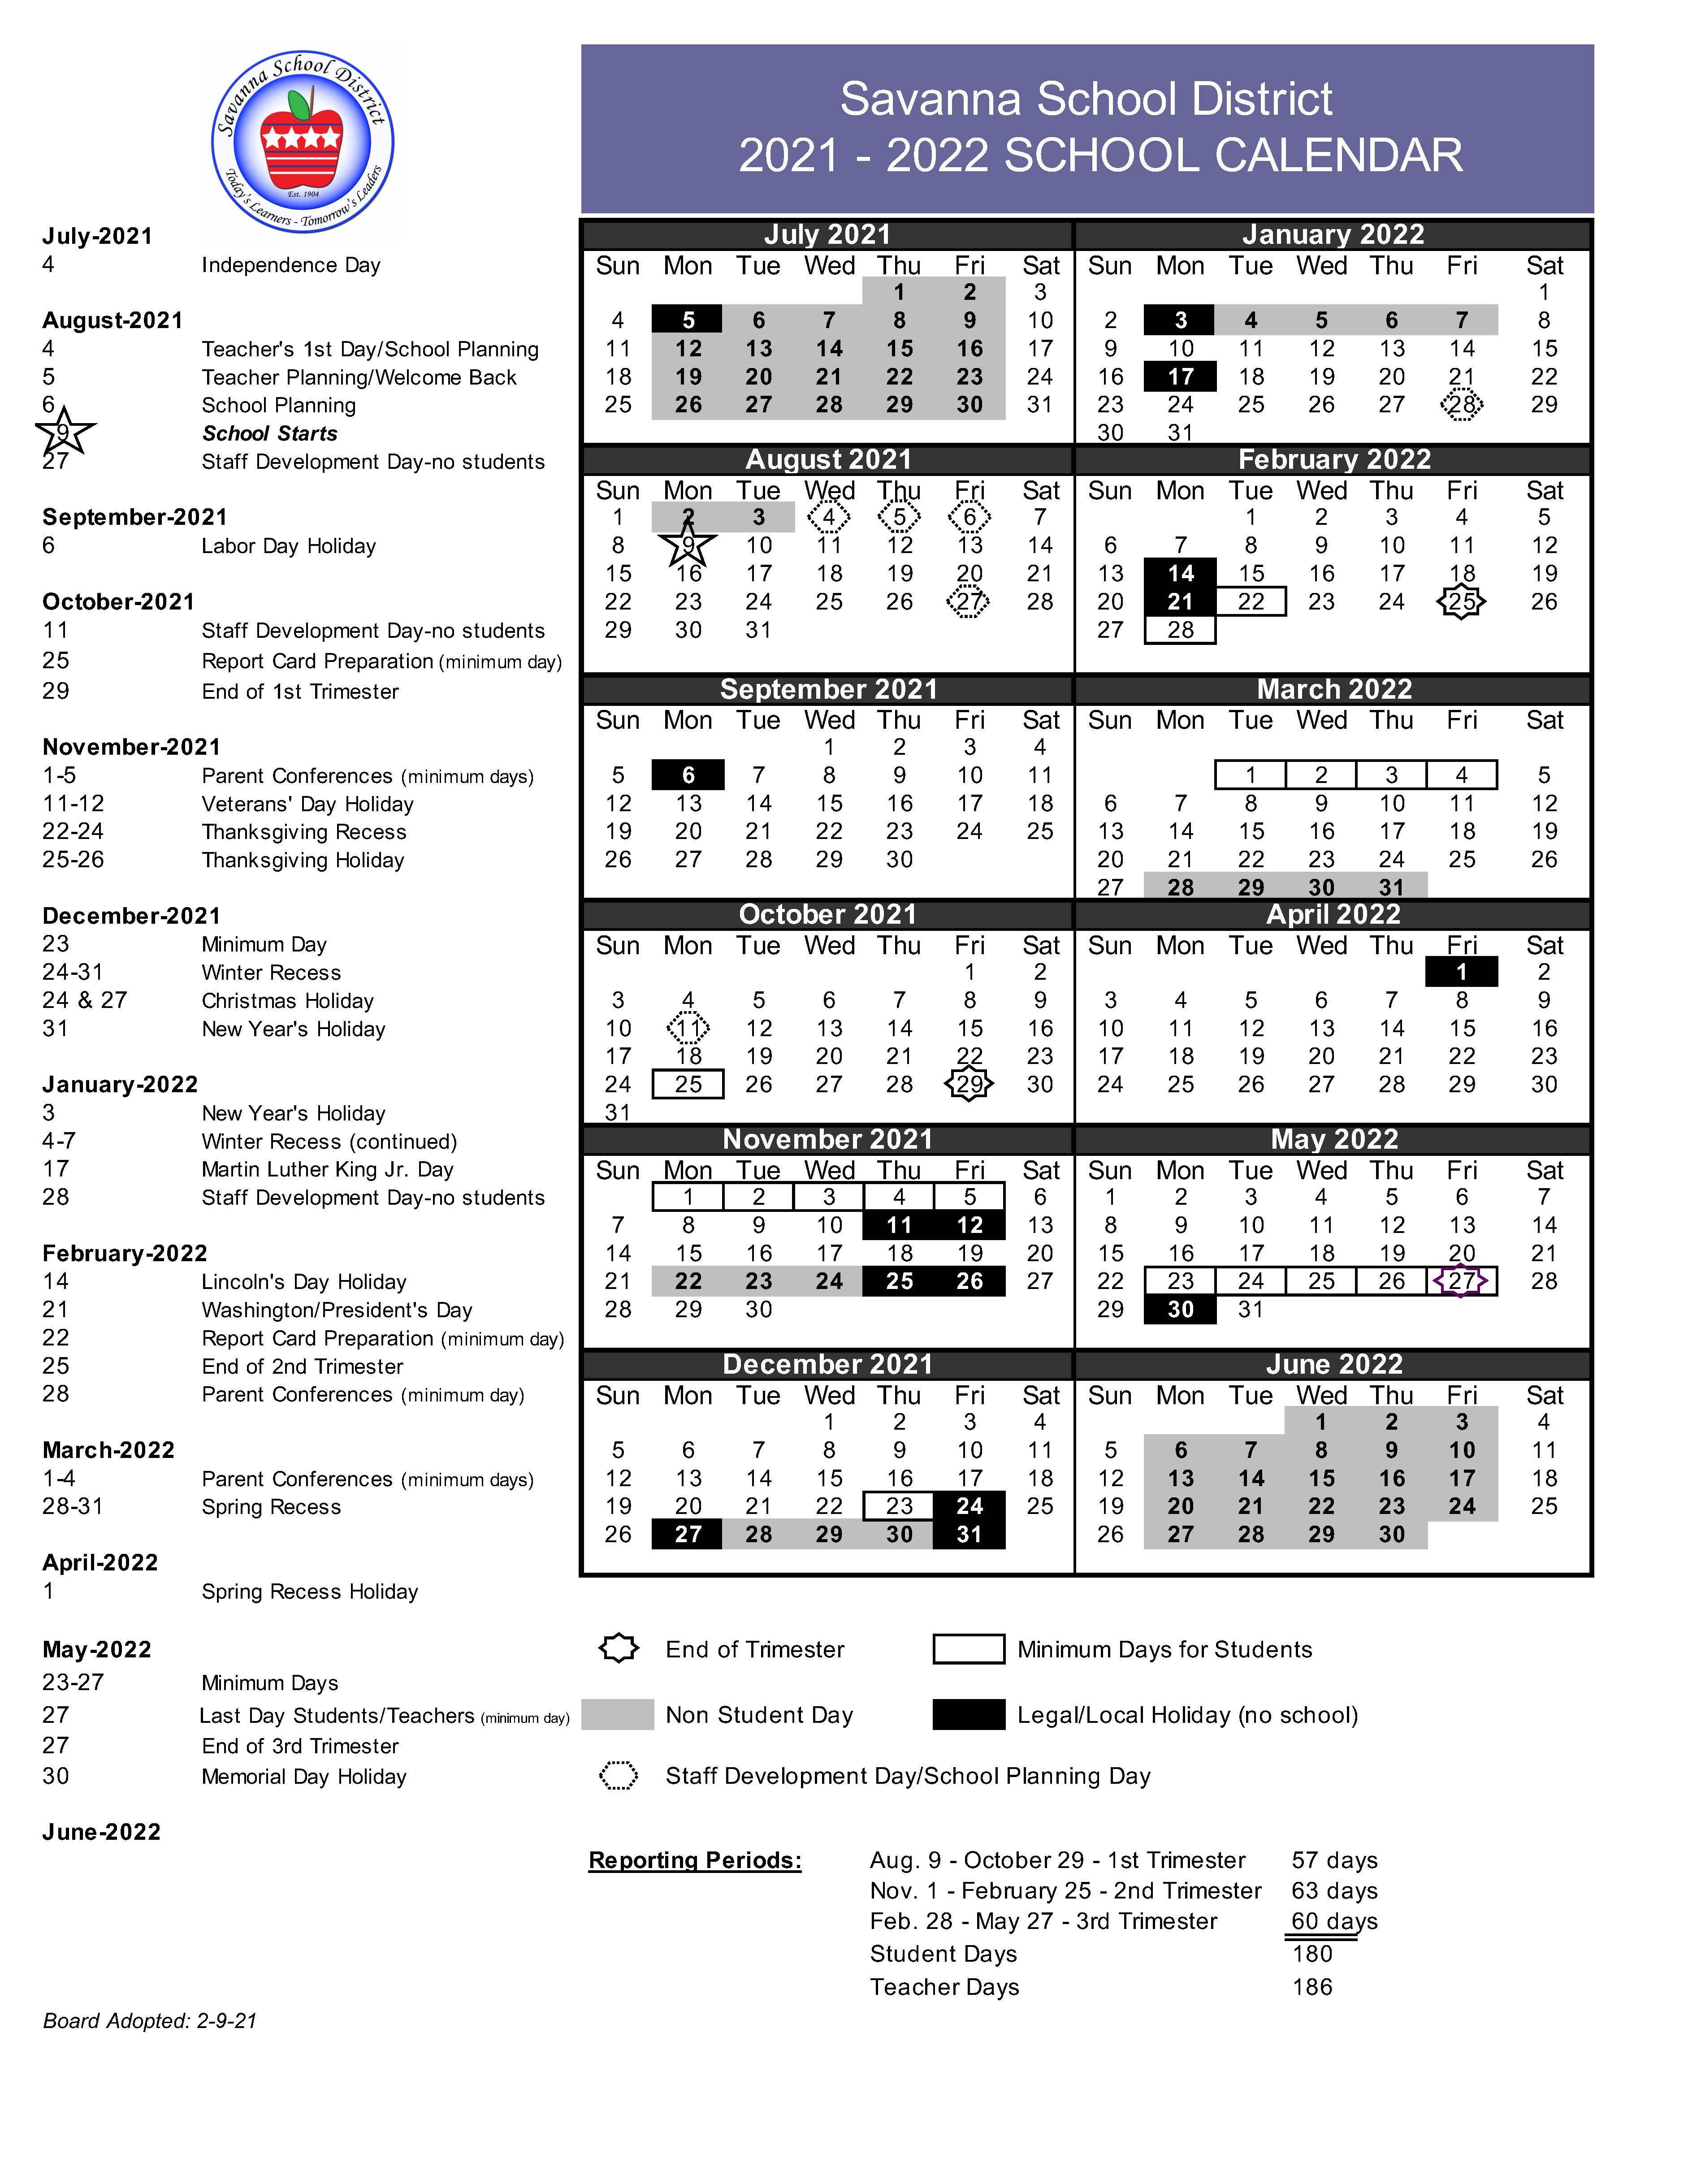 Ucla Academic Calendar 2022 23.Savanna School District Academic Calendar